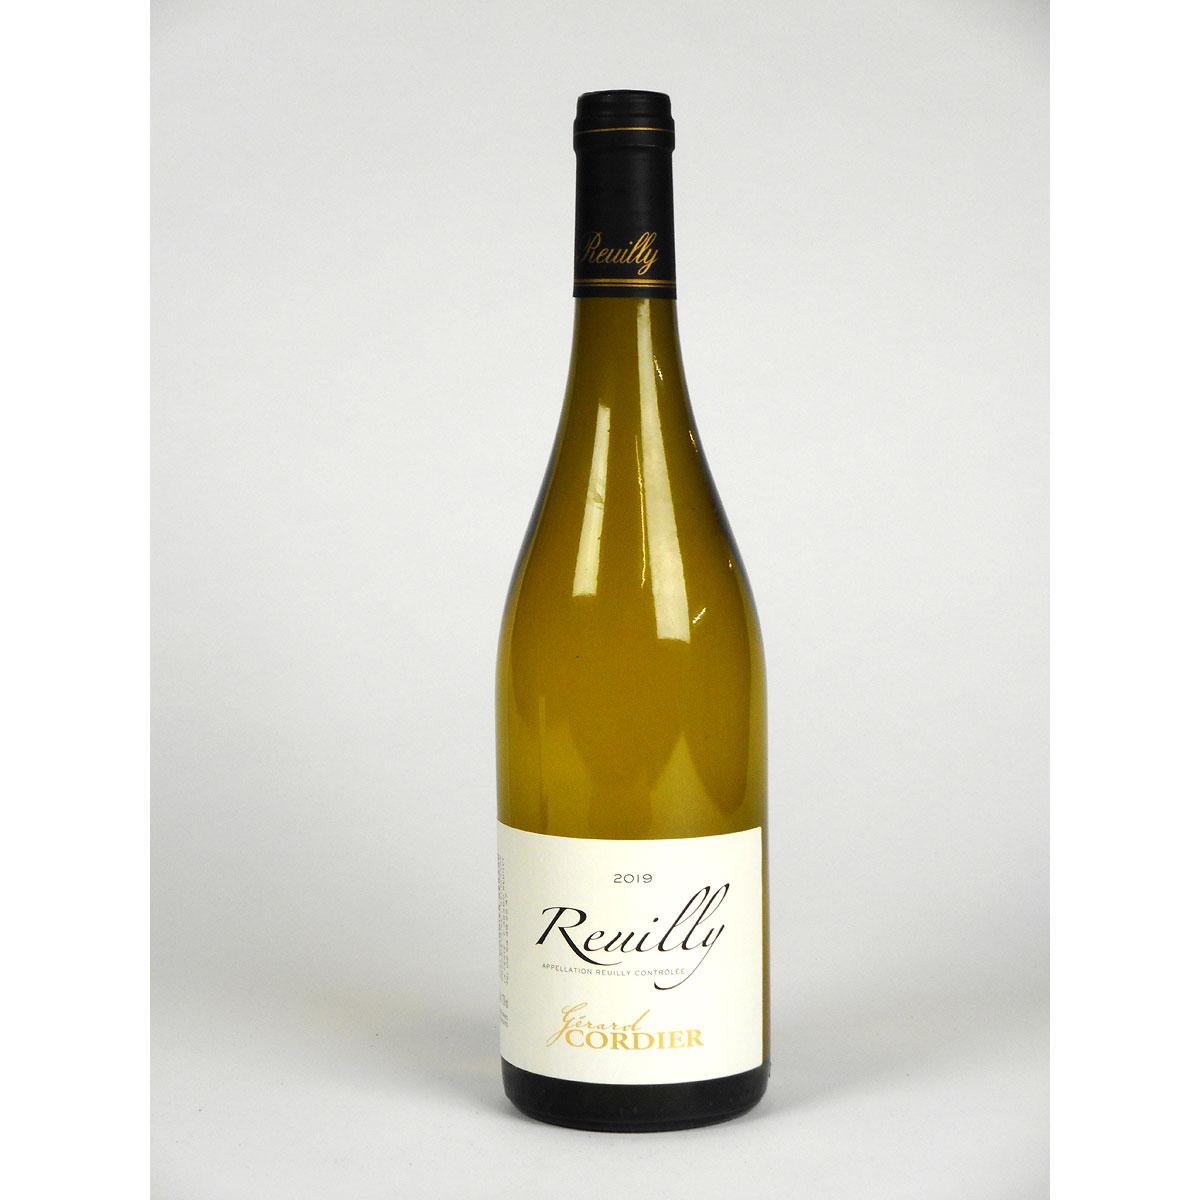 Reuilly: Gerard Cordier Blanc 2019 - Bottle